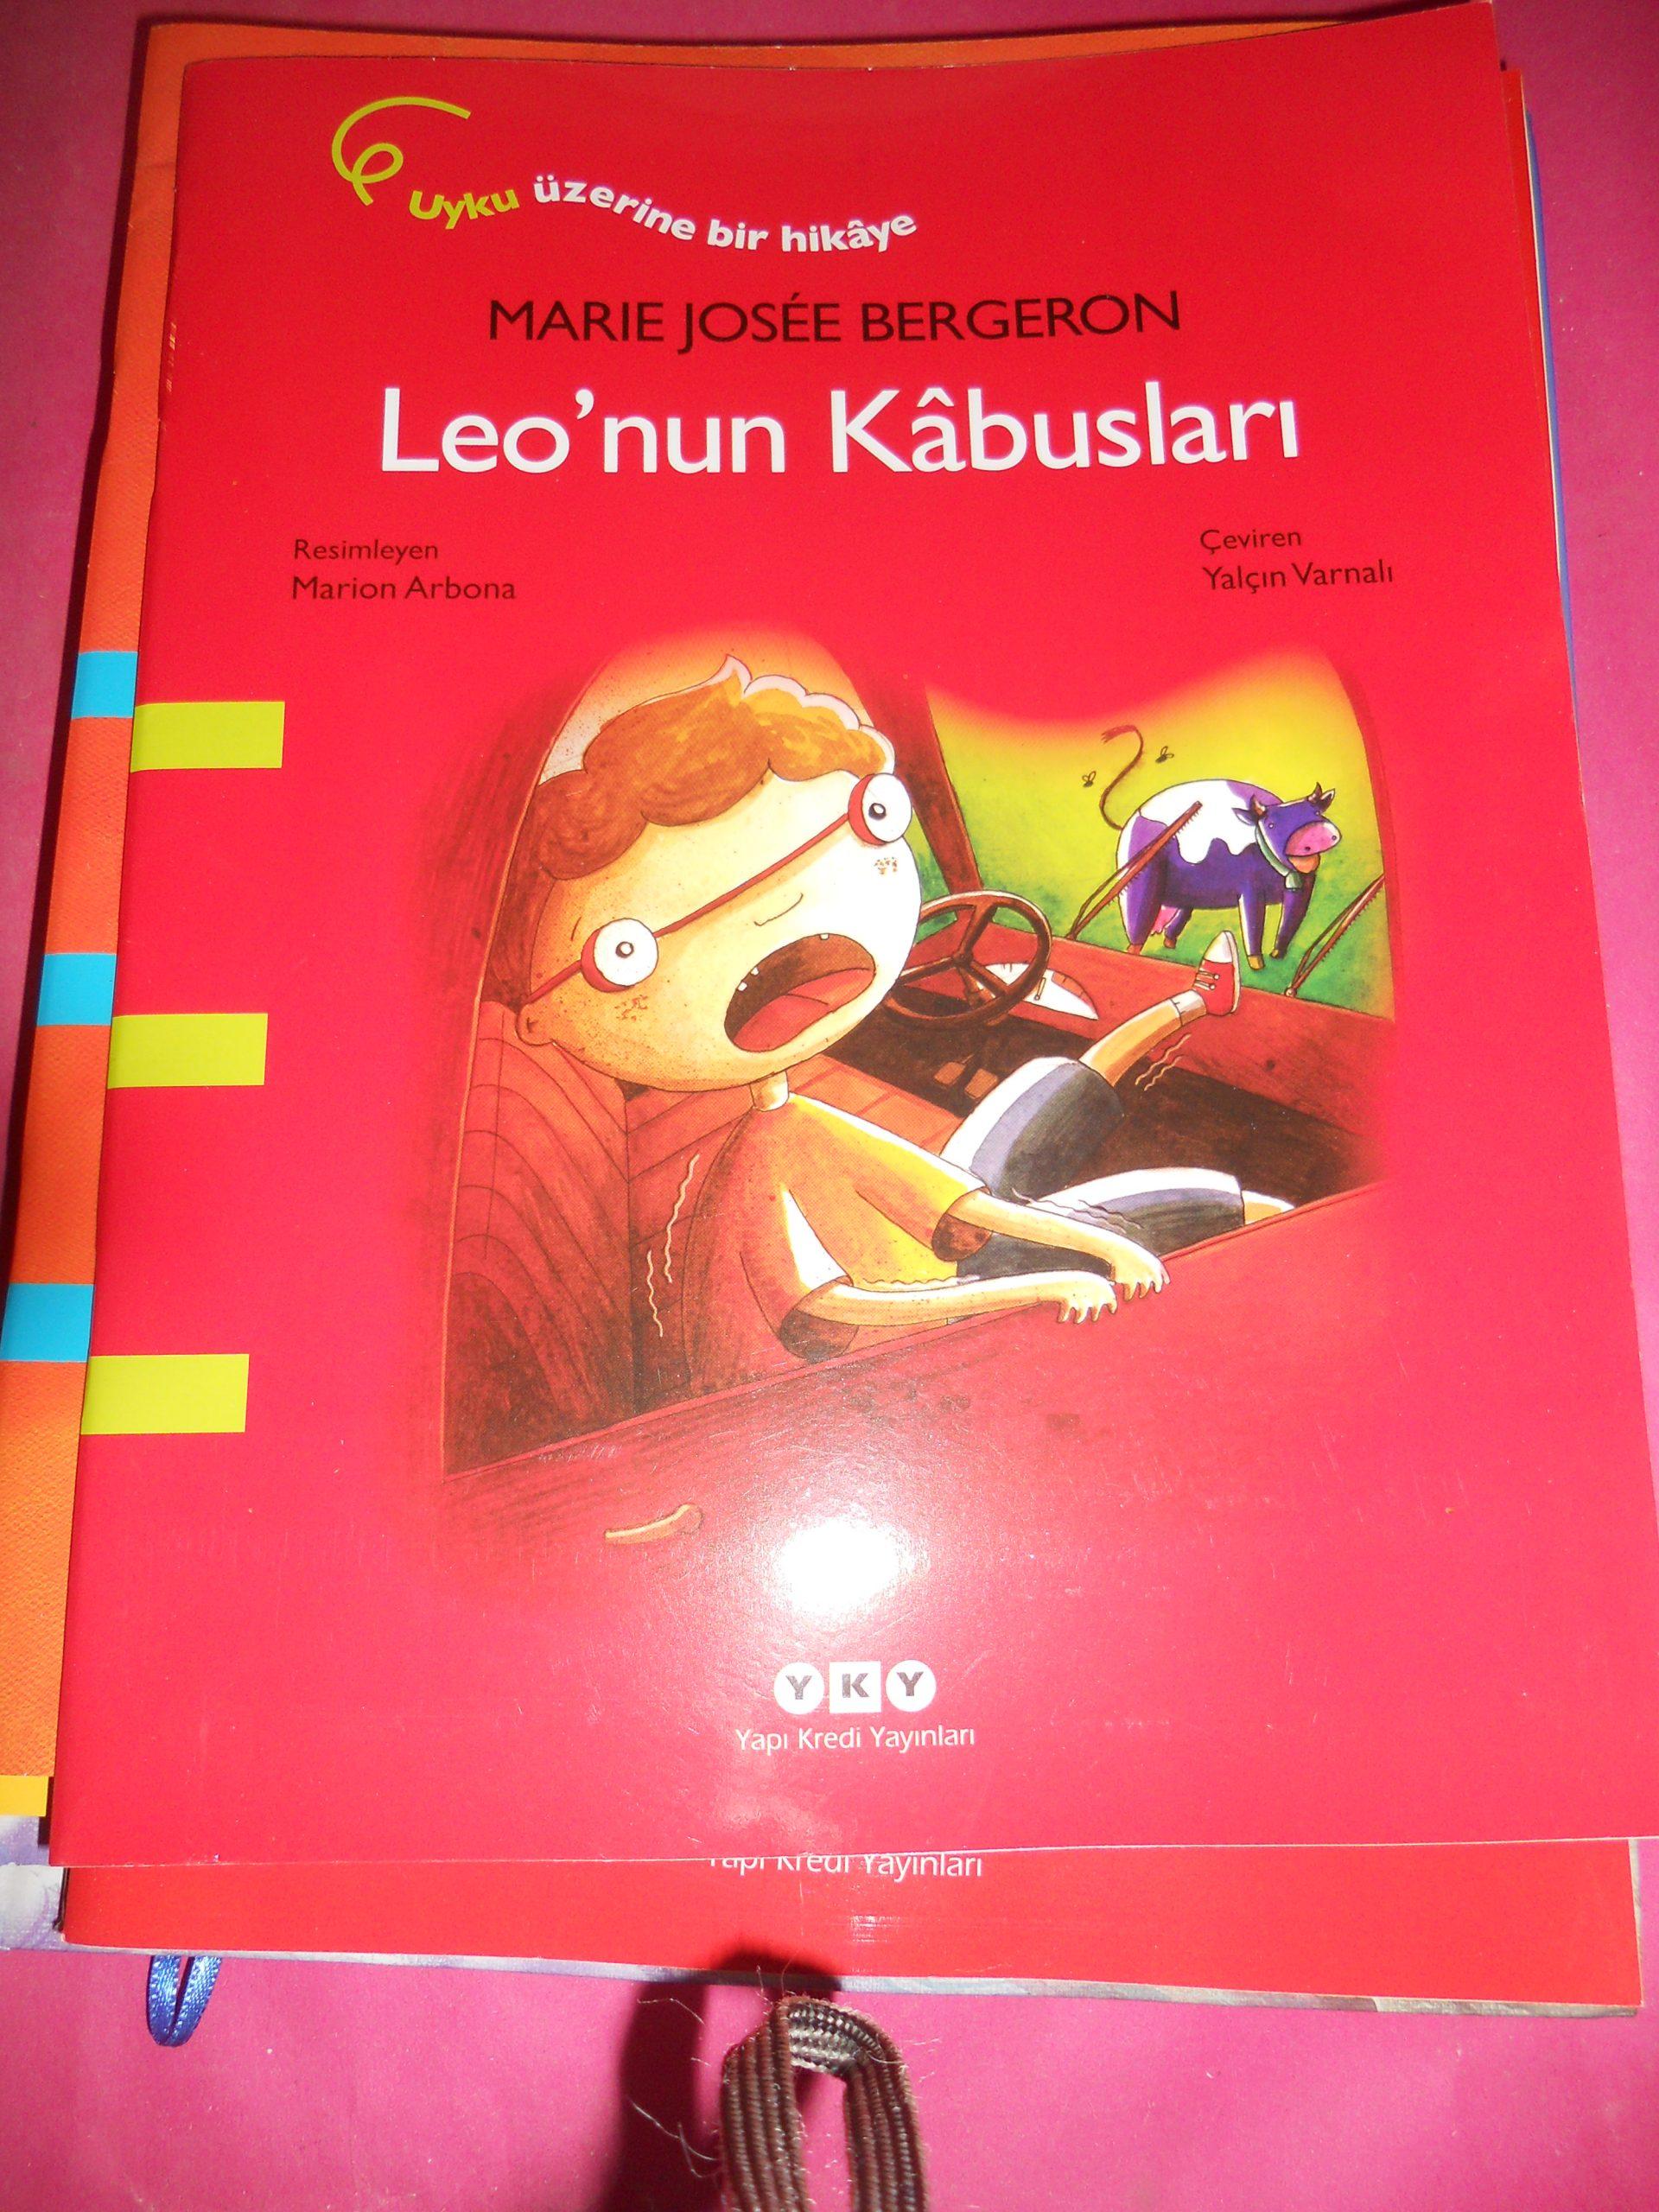 LEO'NUN KABUSLARI/Marie Josee Bergeron/10 TL